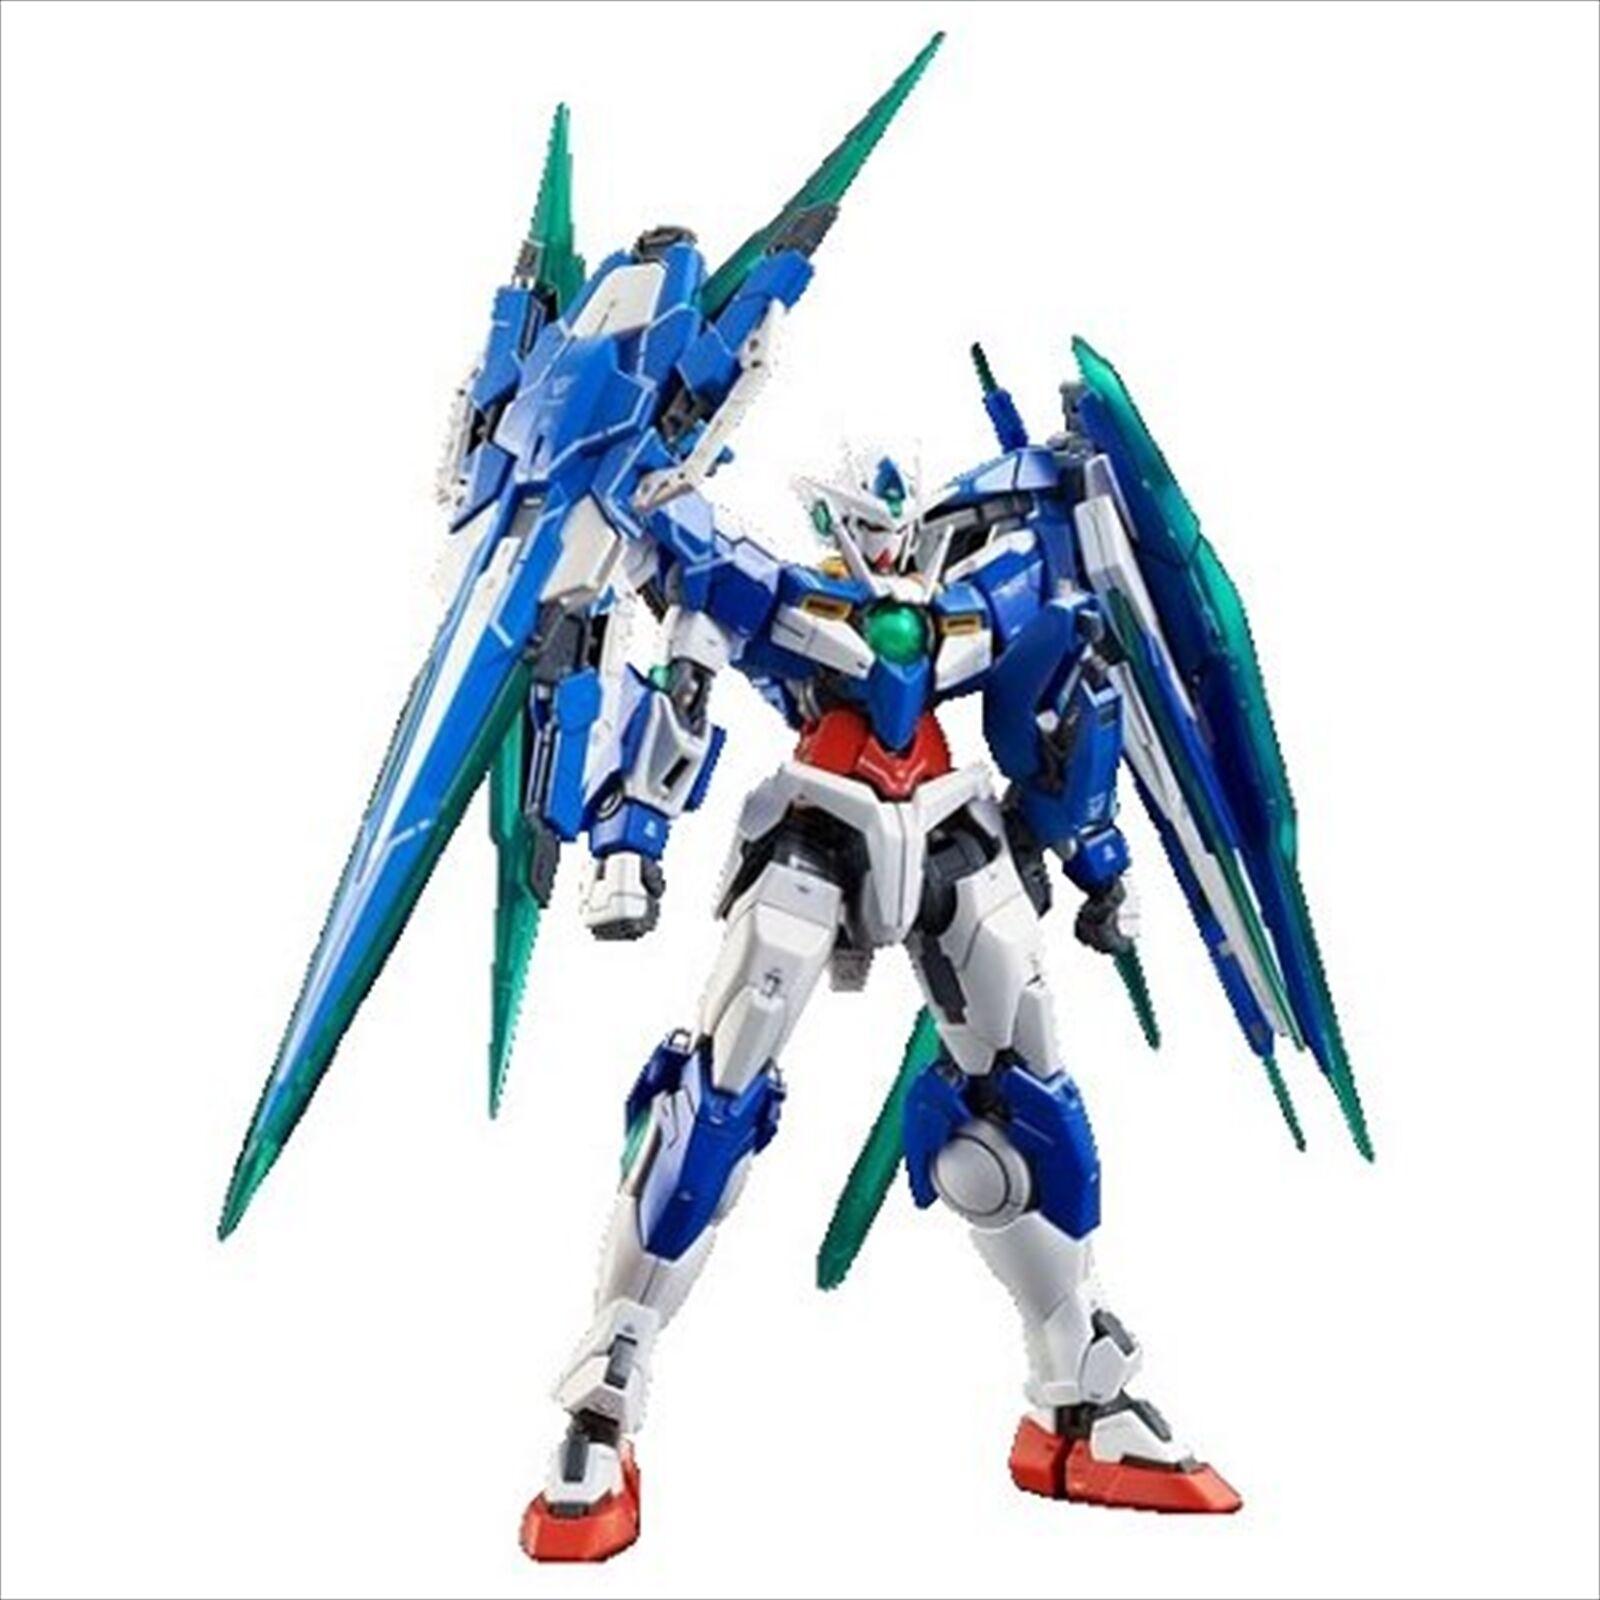 RG 1 144 GNT-0000 FS 00 Quanta Qan[T] Full Saber Plastic Model Kit